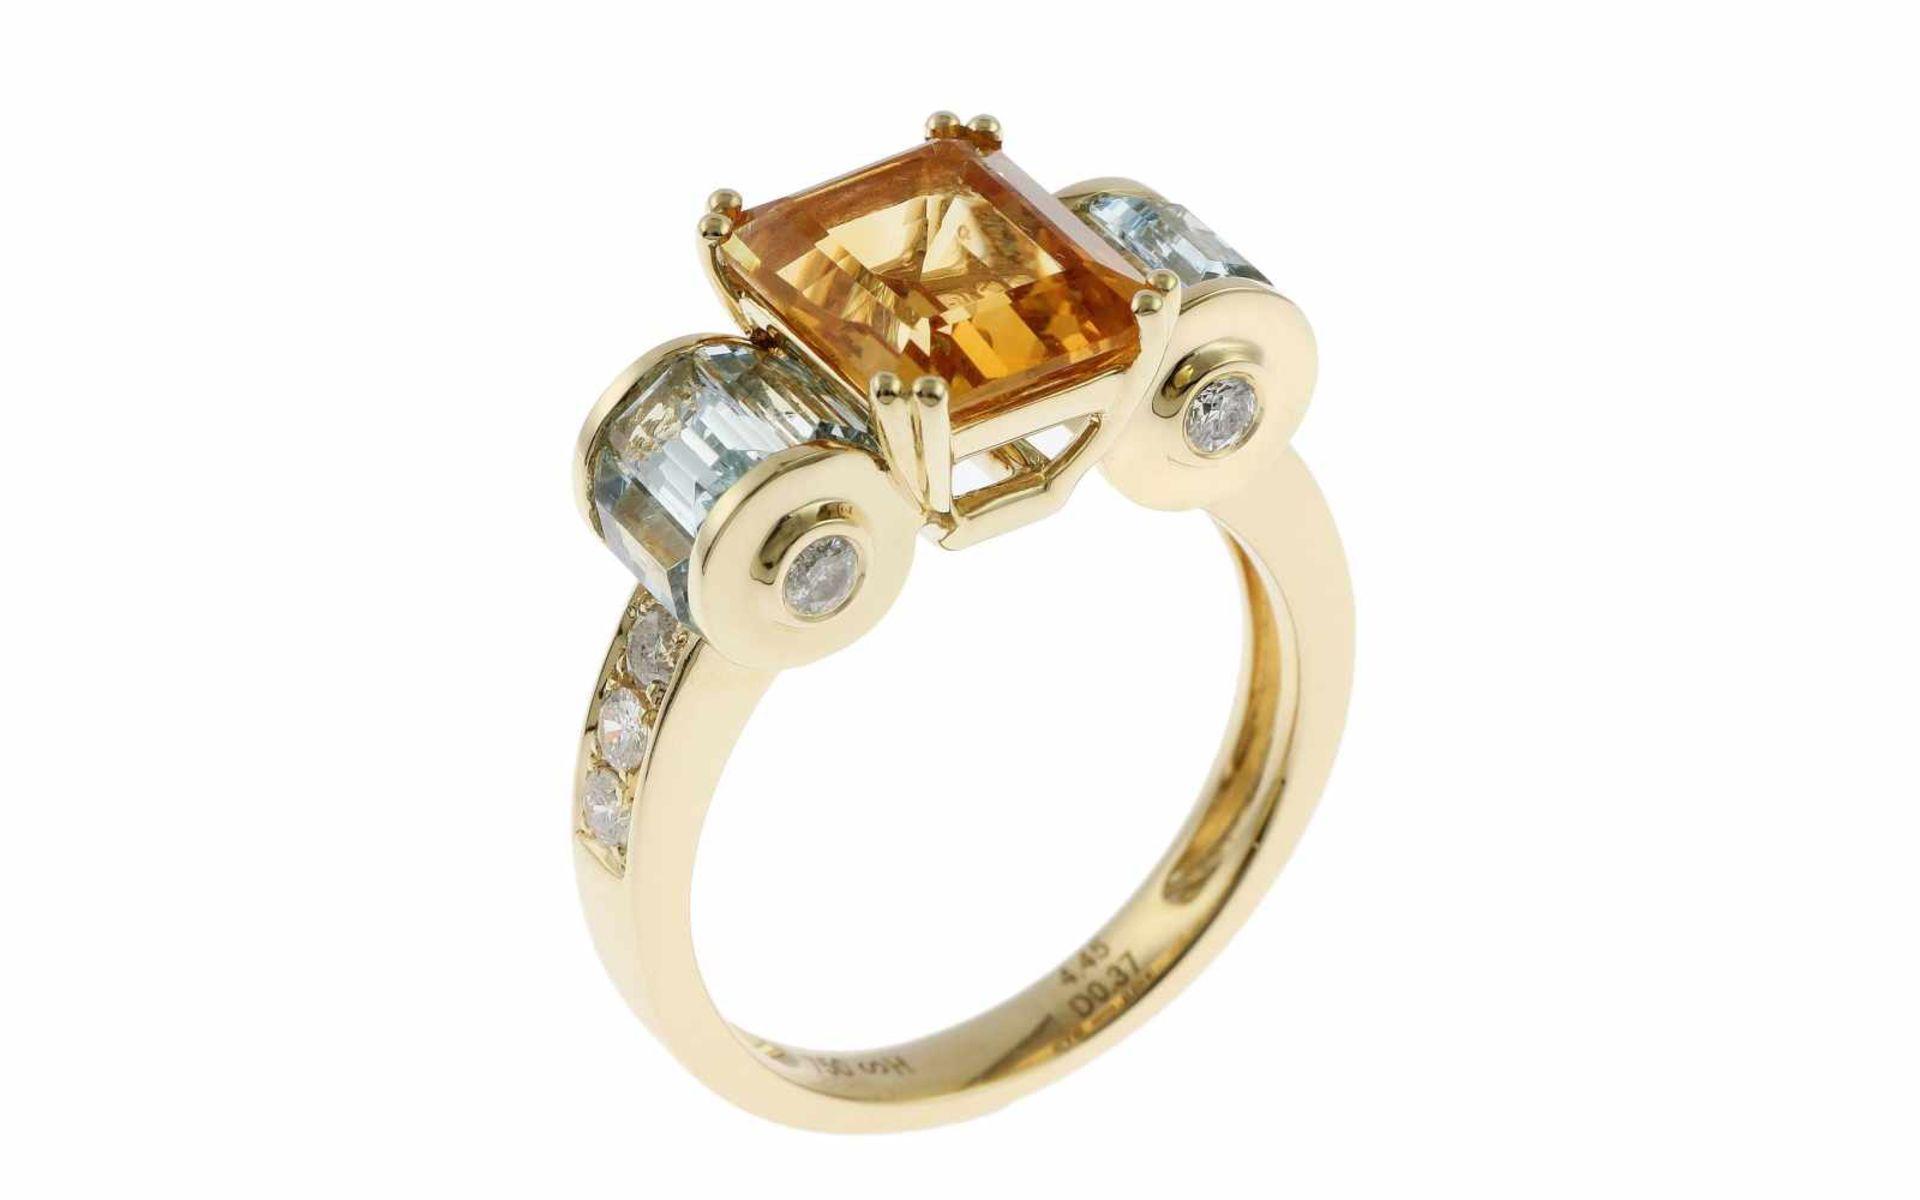 RingRing 18K GG mit 0,37 ct Diamanten H/si , 2,64 ct Citrin und 1,81 ct Aquamarinen RW: 55 Total 6,